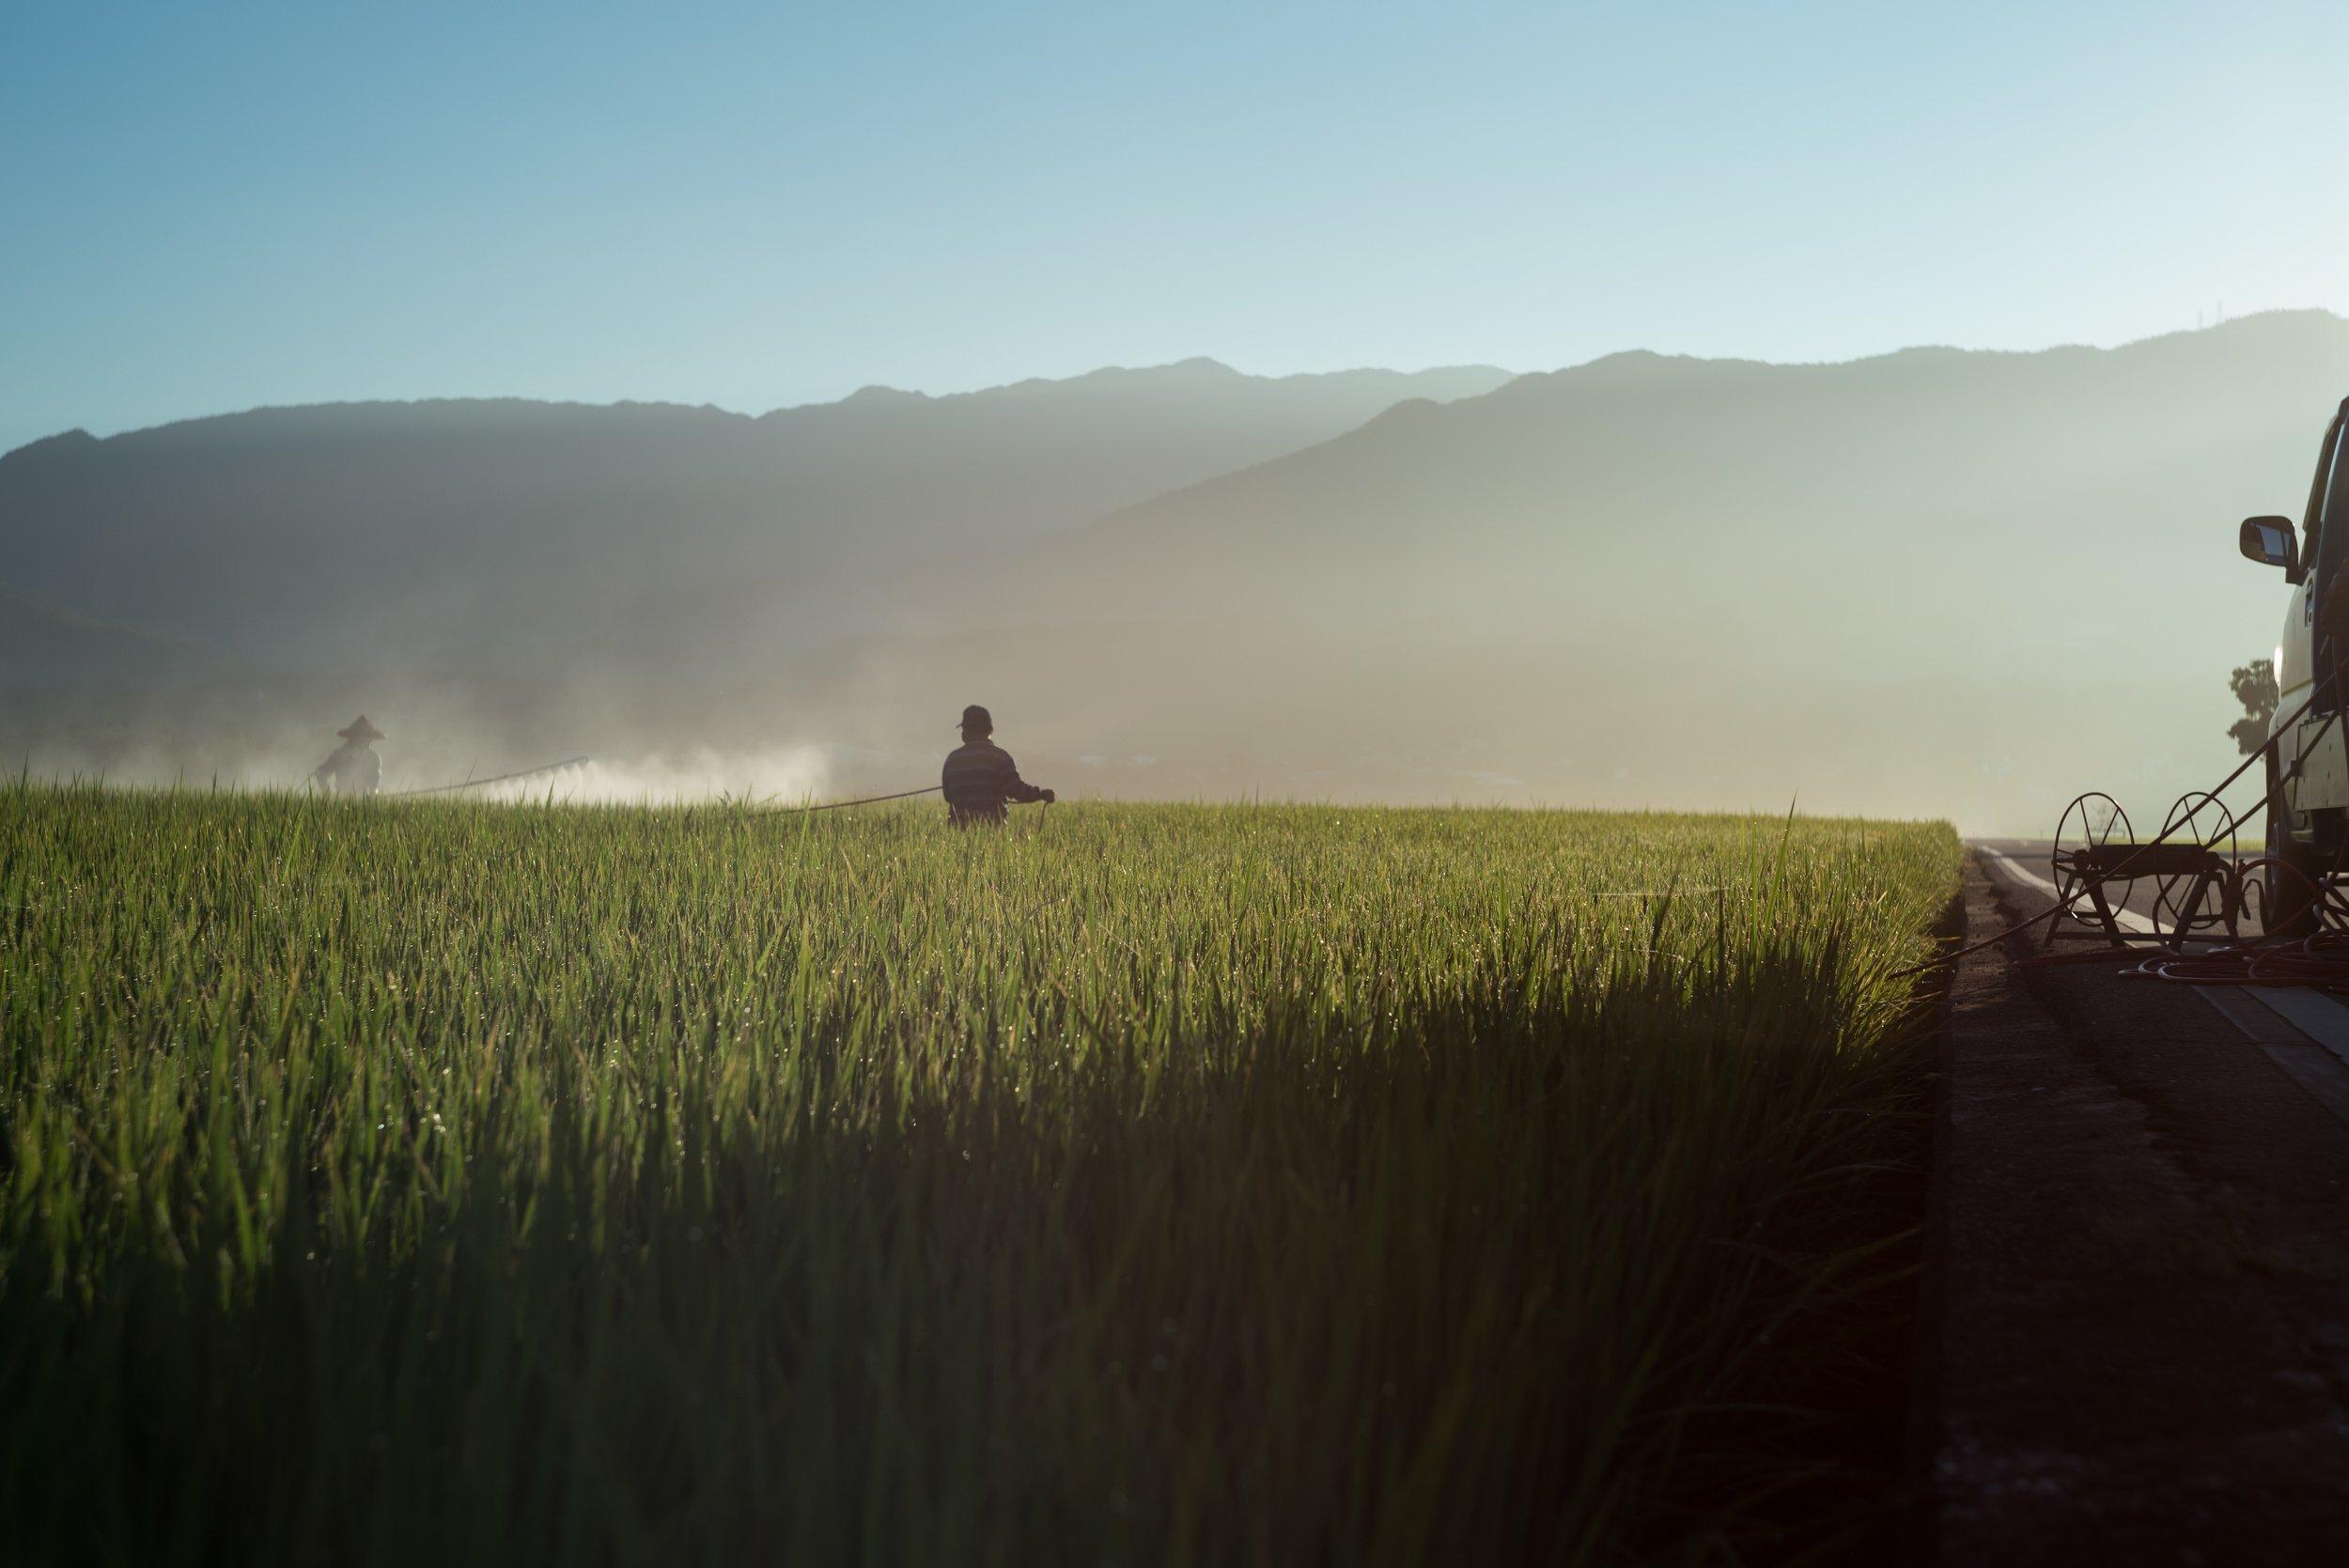 cropland-crops-daylight-1476091.jpg